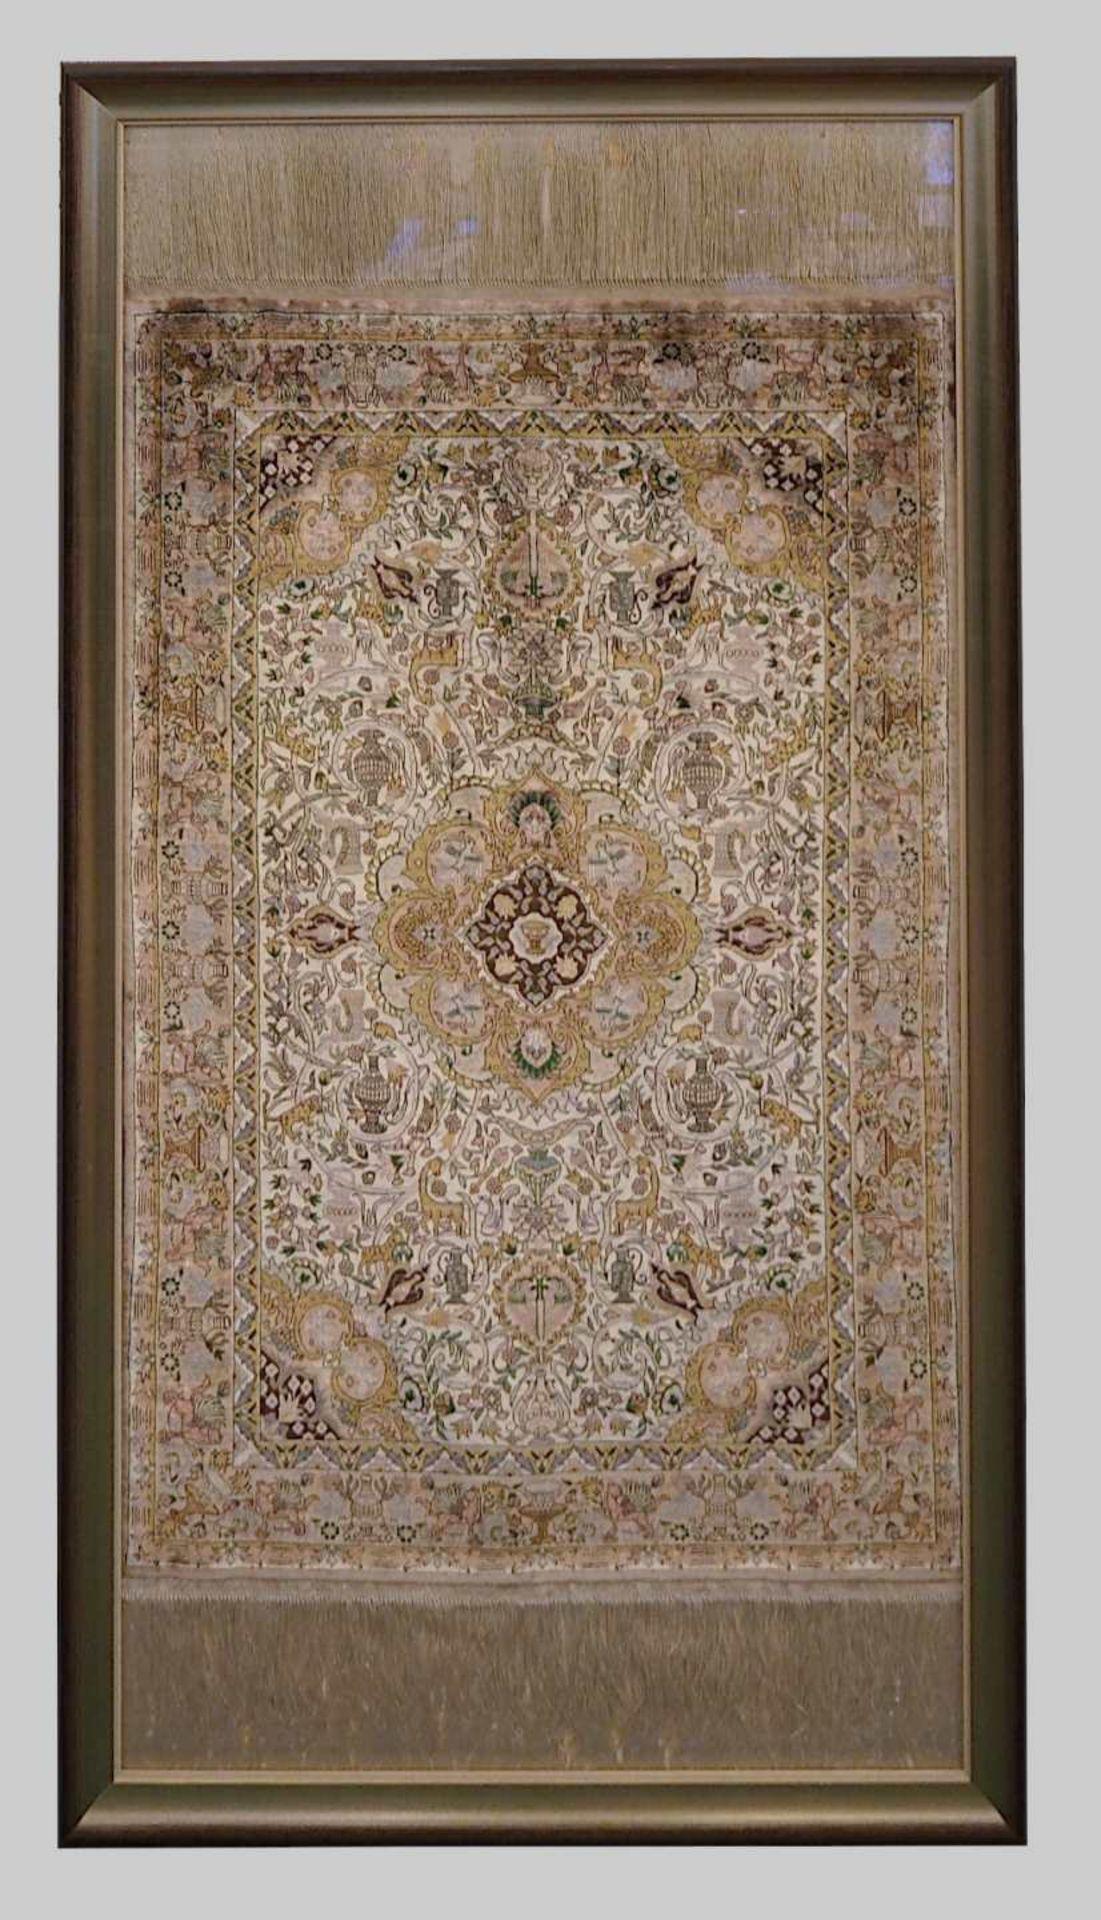 1 Teppich Seide wohl China beigegr., floraler-/Tierdekor, Mittelmedaillon, Mehrfachbor